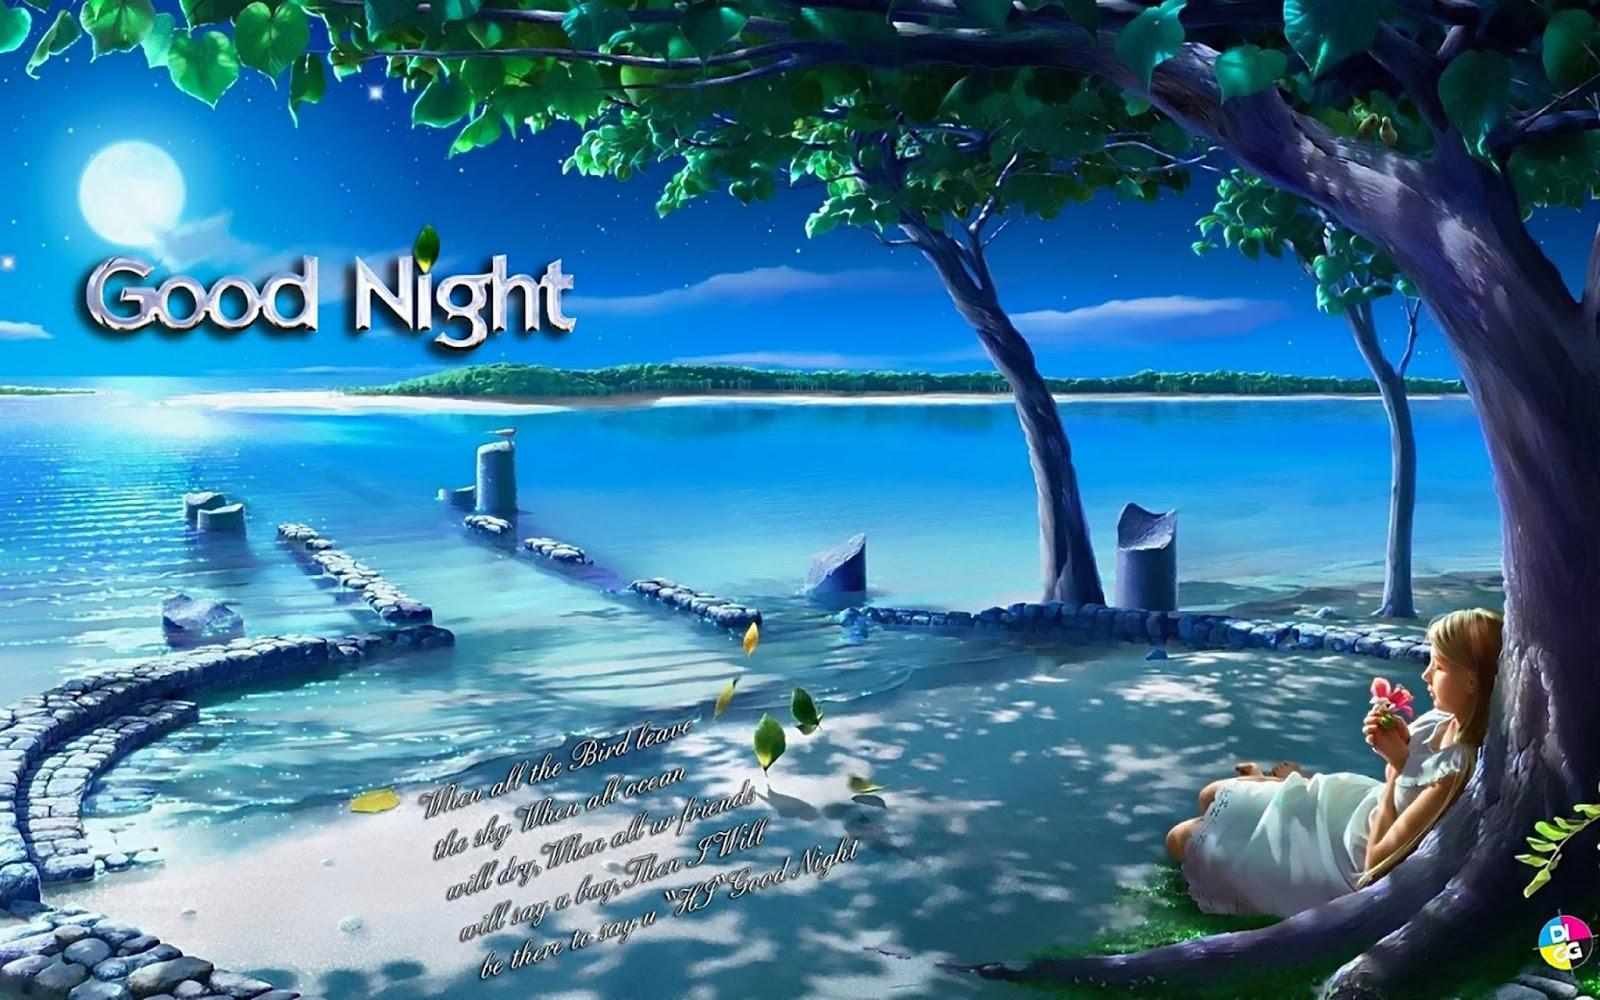 Good-Night-Image-HD